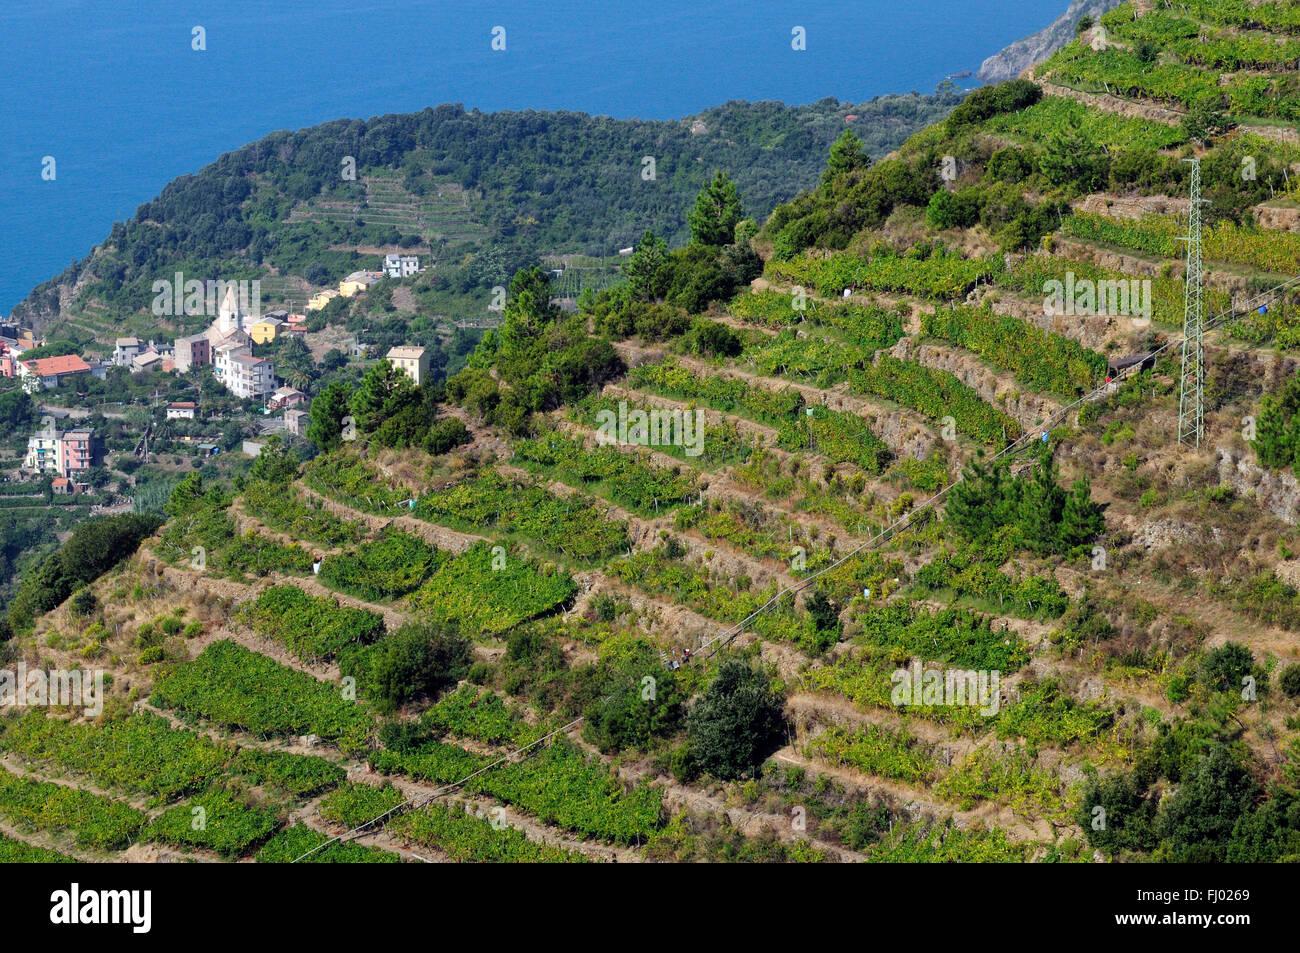 A vineyard of Schiacchetrà vine overlooks the coast on the cliffs of the Mediterranean along the Italian Riviera, - Stock Image